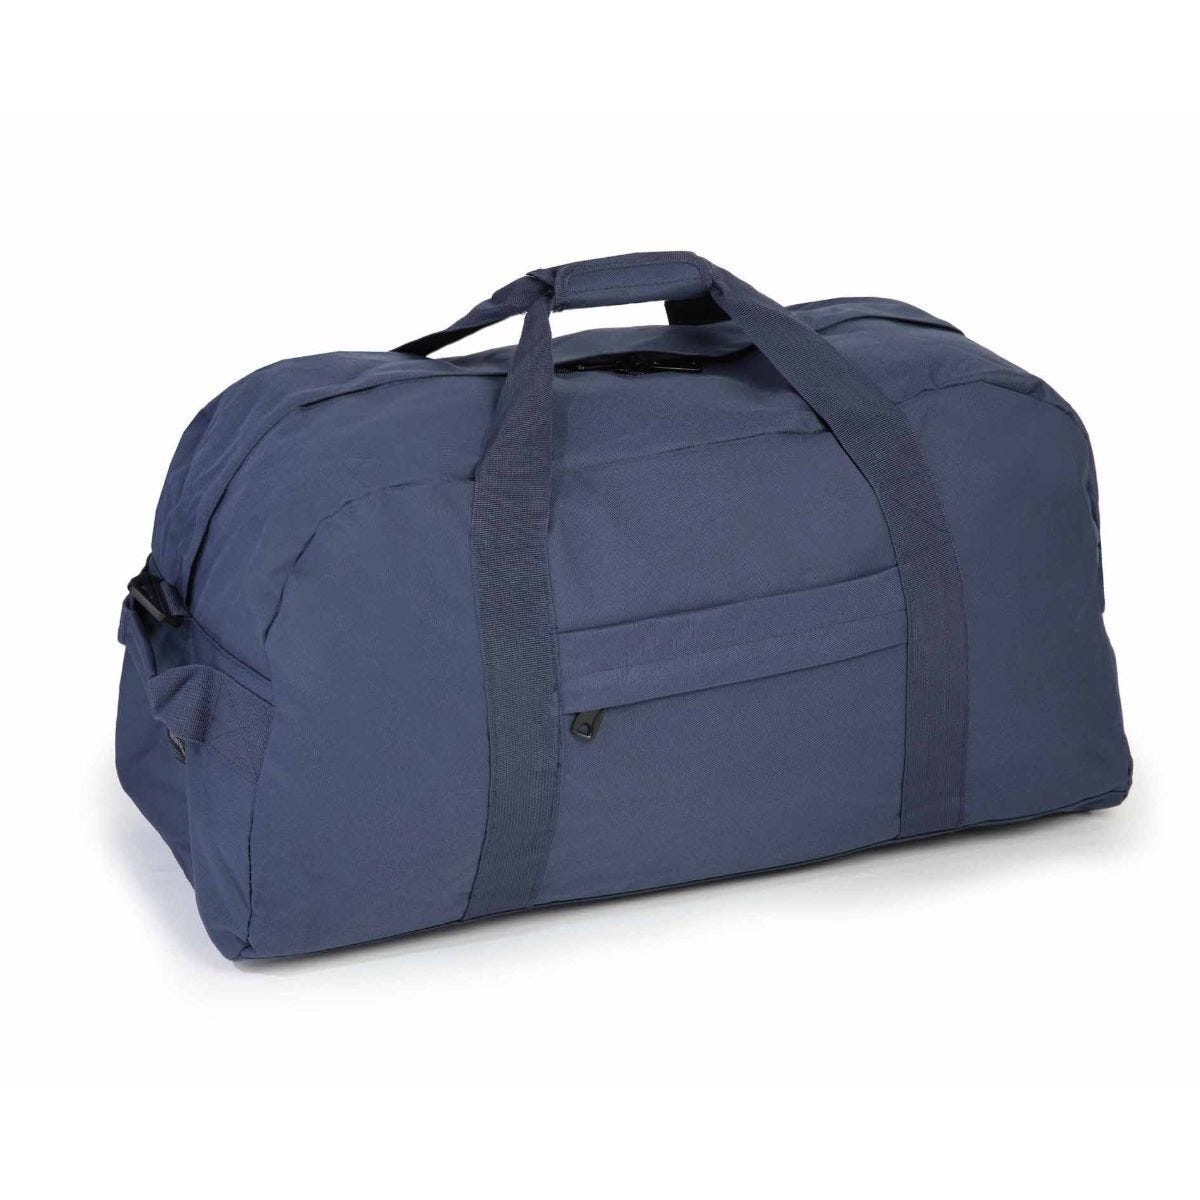 Members by Rock Medium Holdall and Duffle Bag 65cm Navy